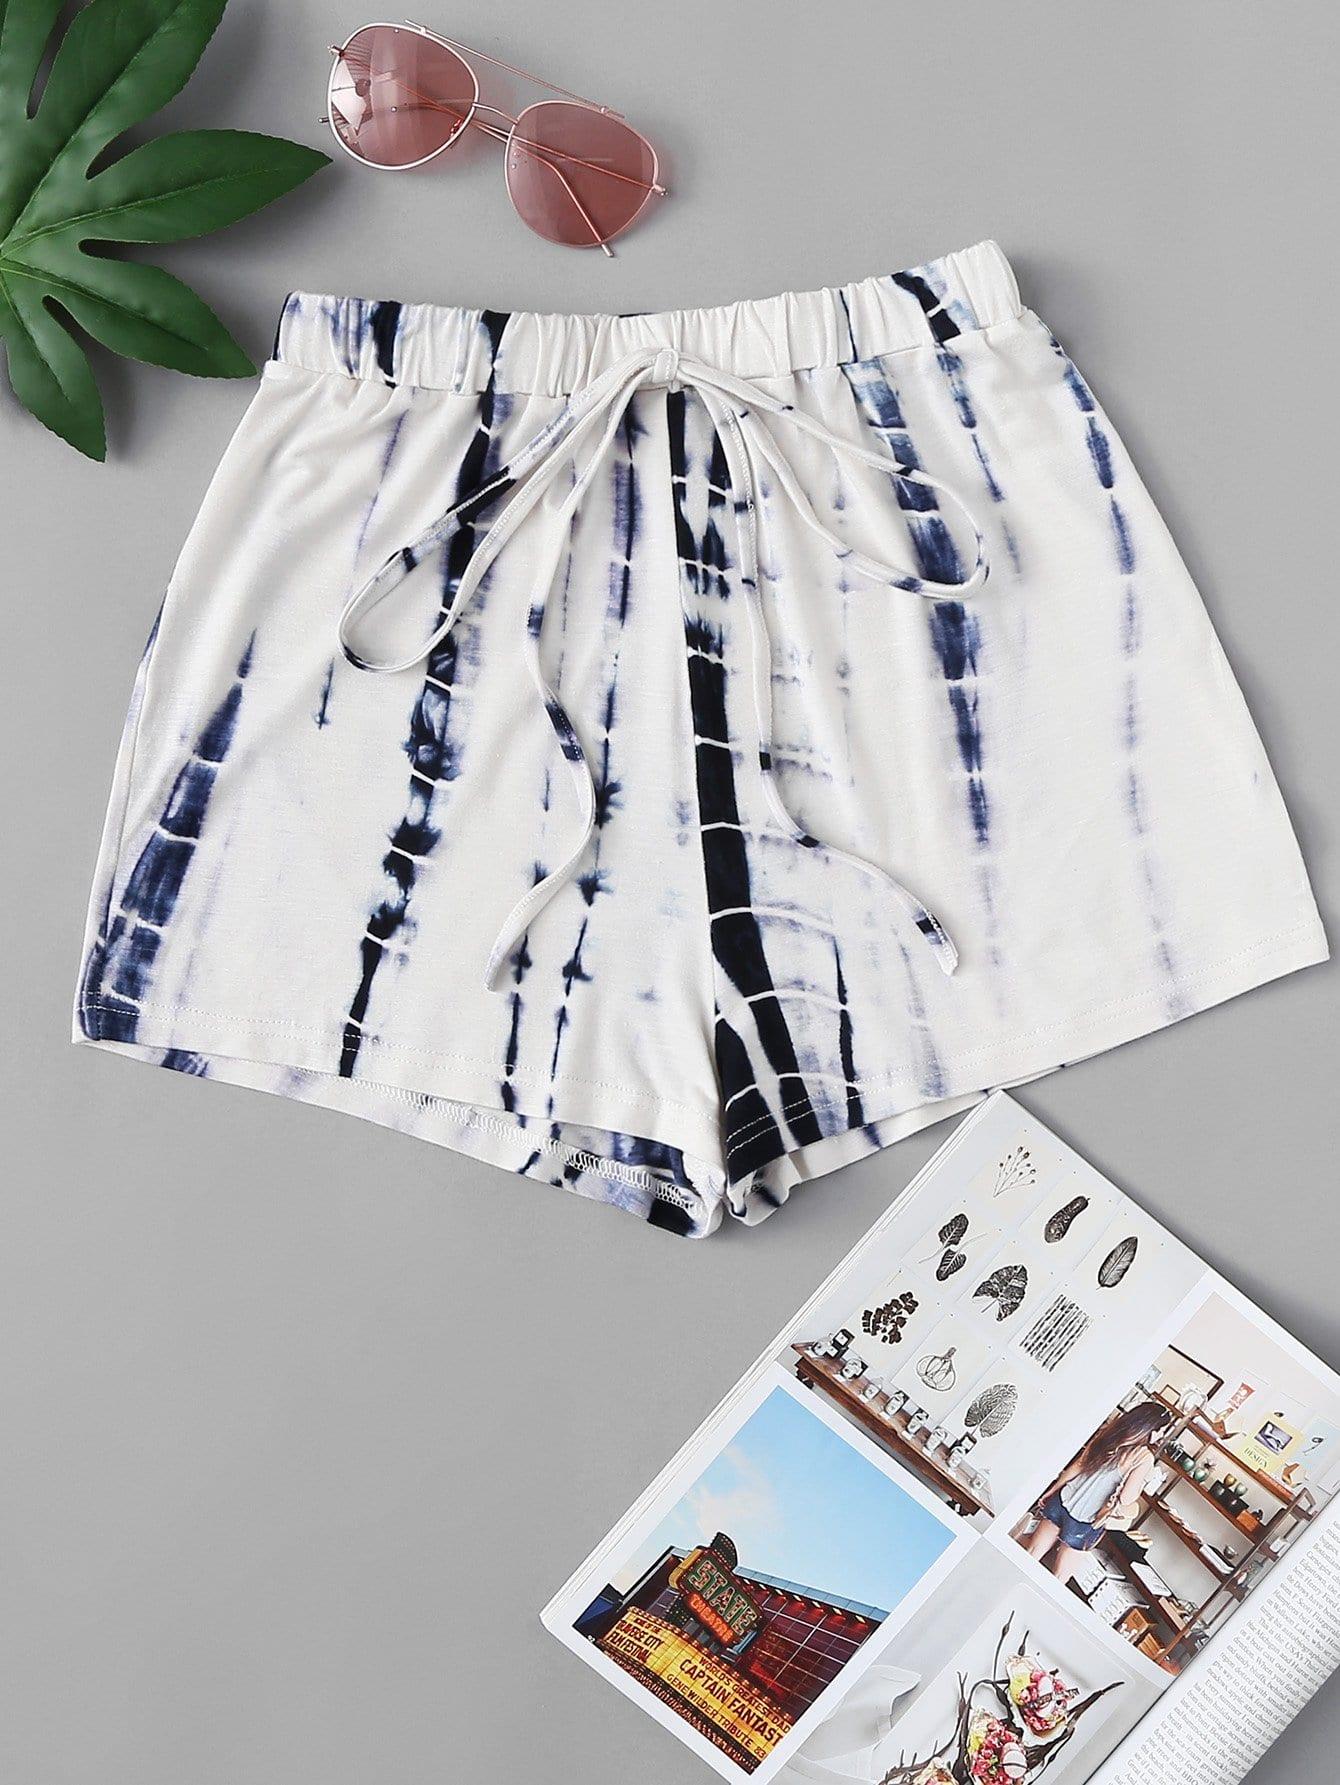 Drawstring Waist Tie Dye Shorts drawstring waist tie dyed shorts